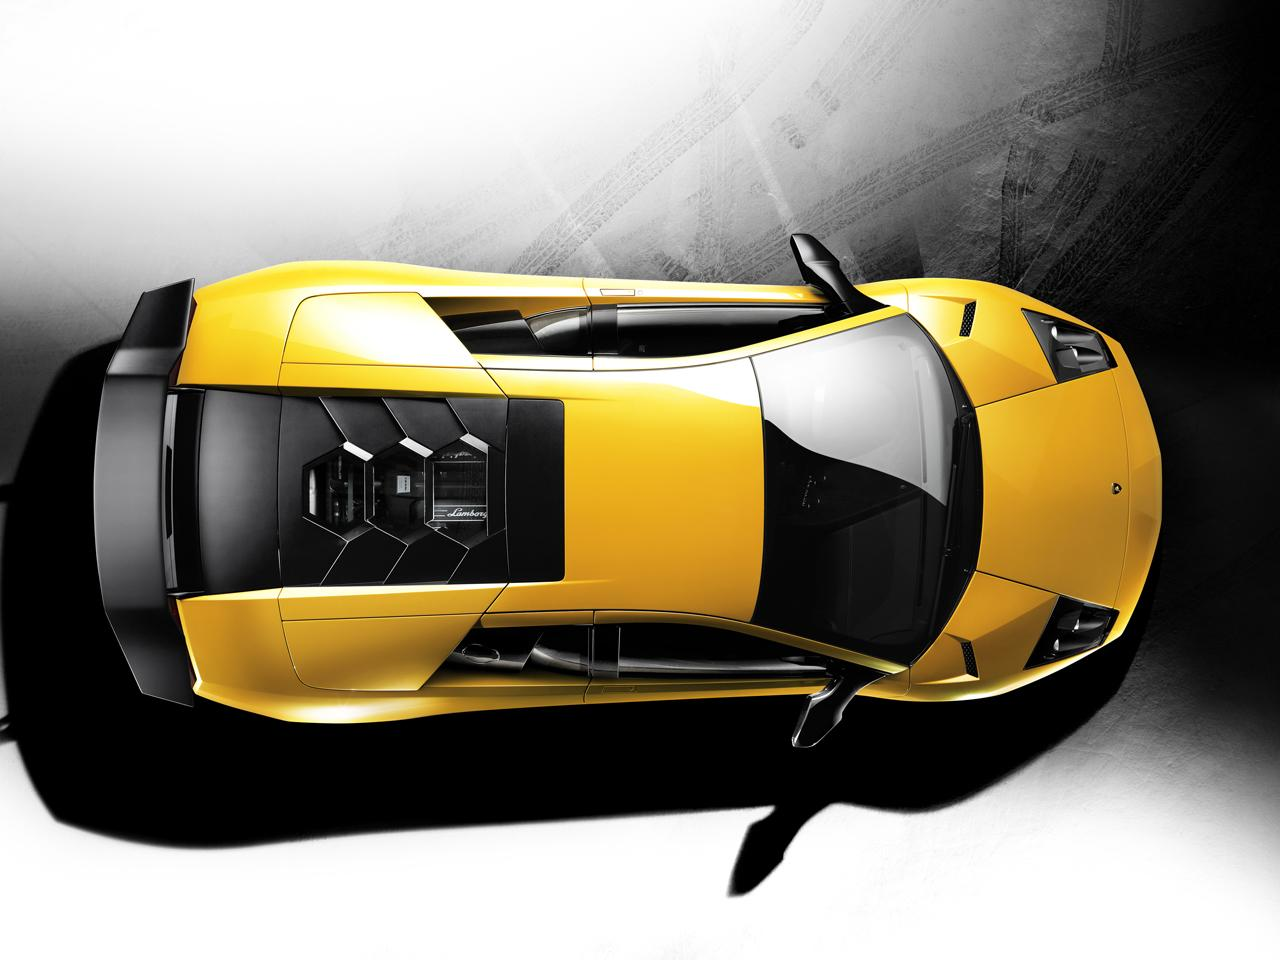 Lamborghini Murcielago LP670-4 Super Veloce 3